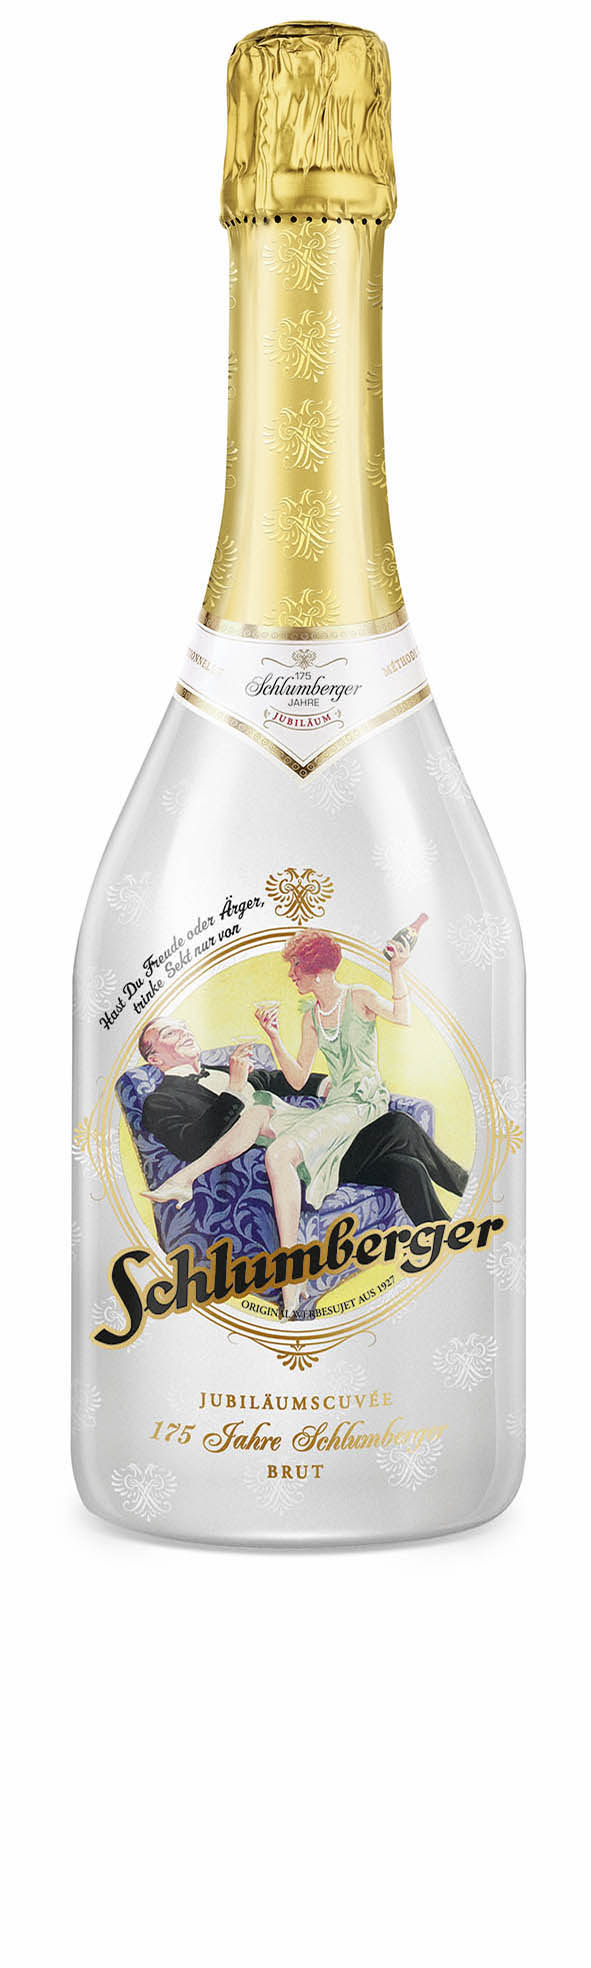 Schlumberger 175 Jahre Jubiläumscuvée